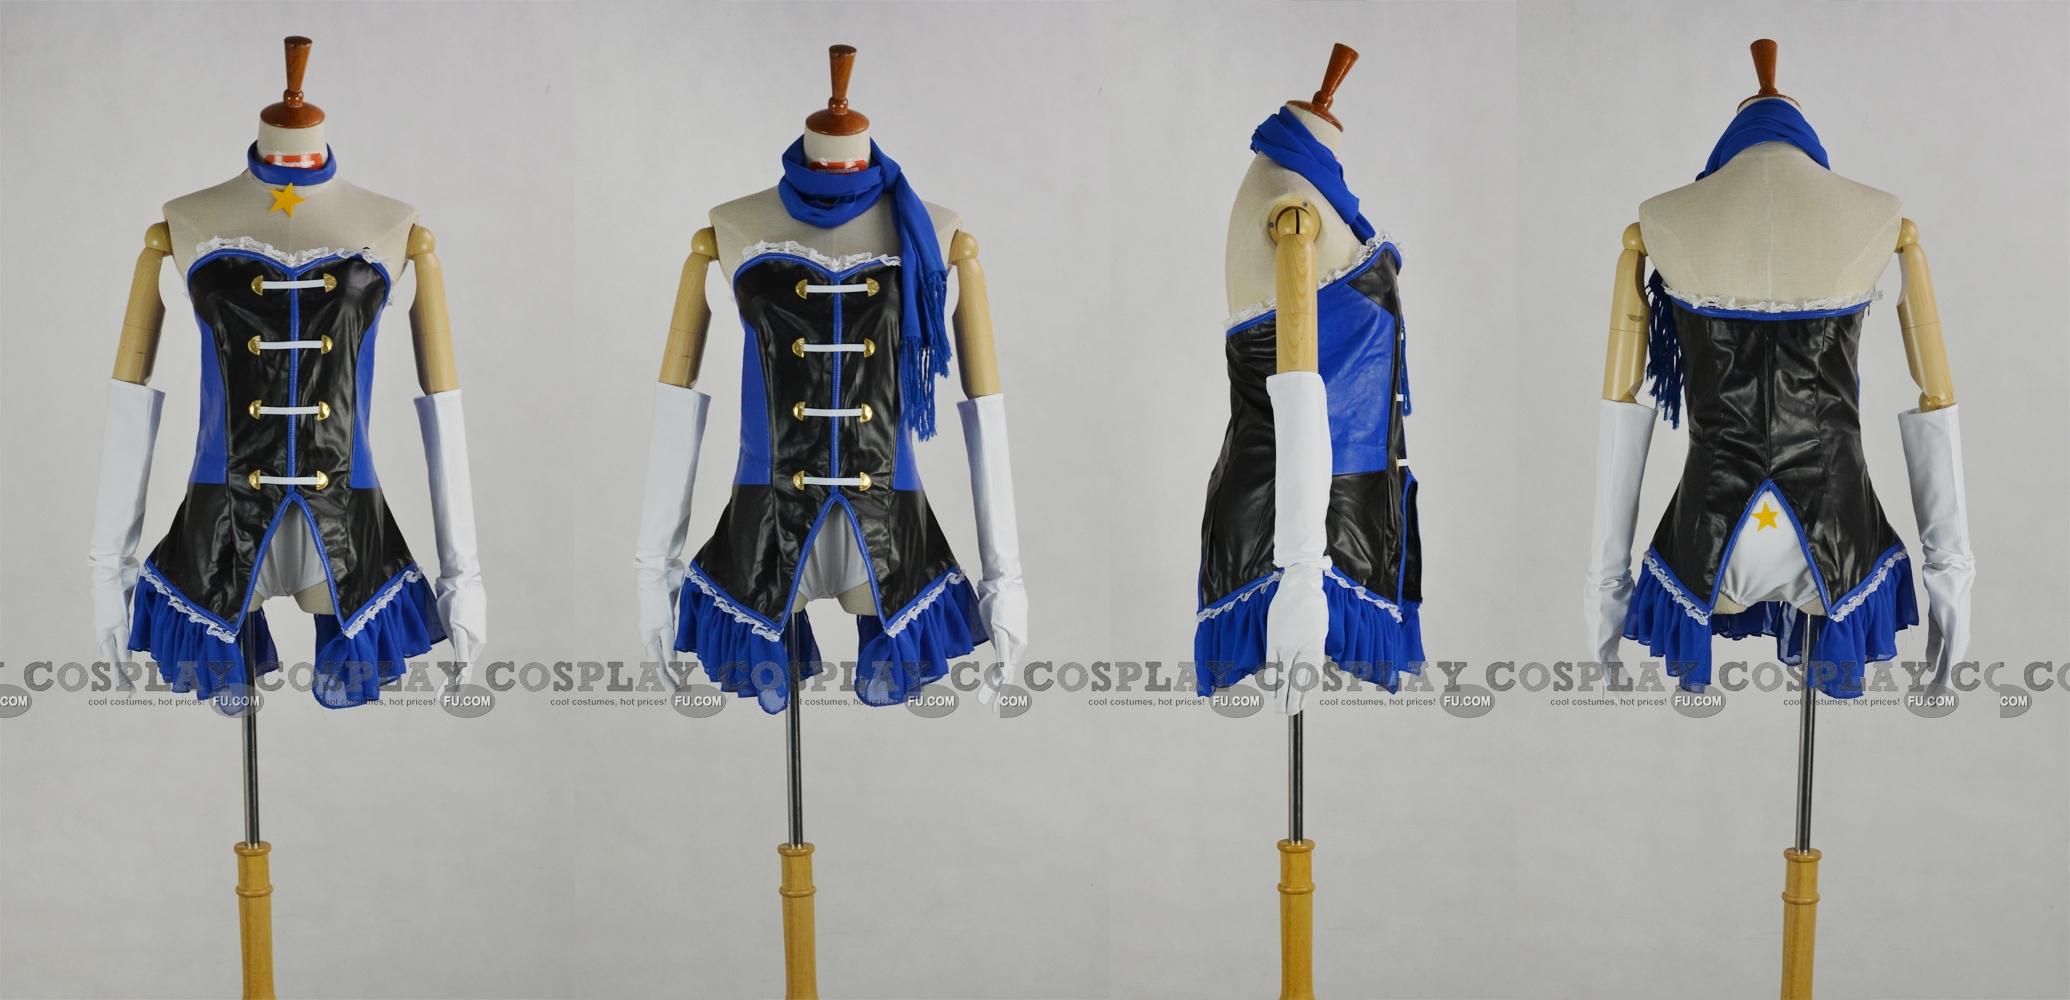 Hikari Cosplay Costume (Blue Version) from Mawaru Penguindrum